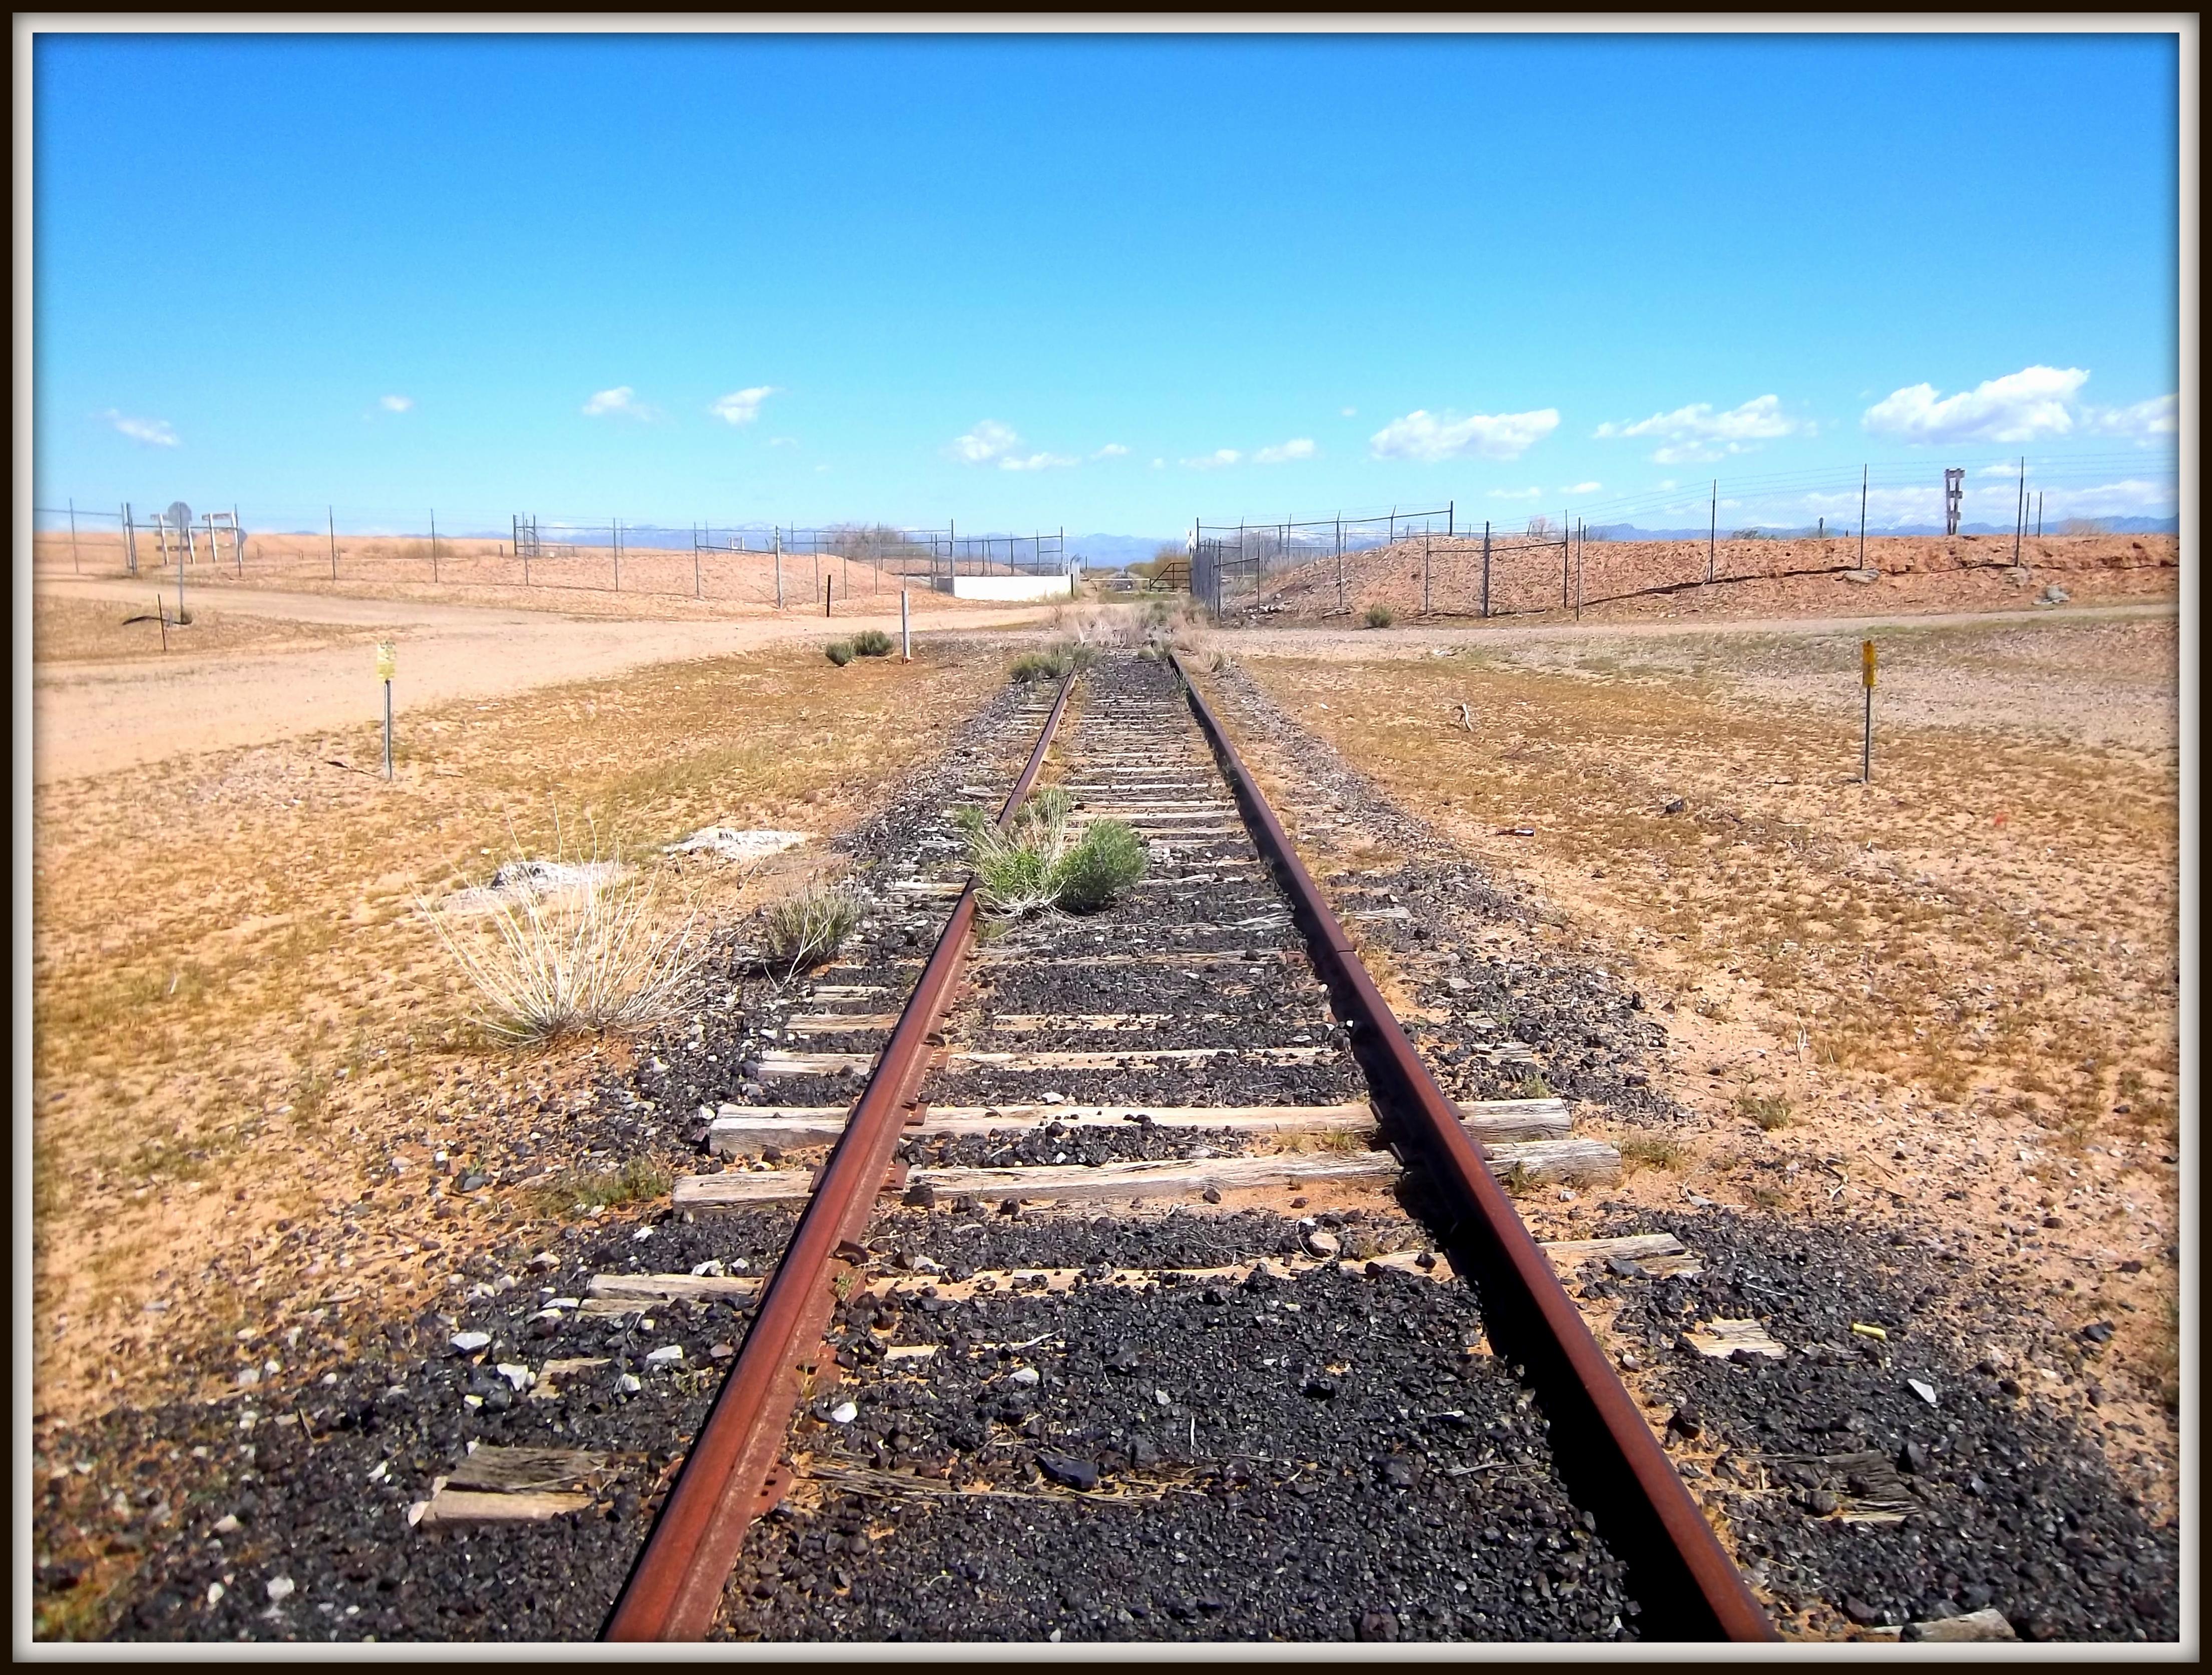 Rail-Road by wtfyourhigh